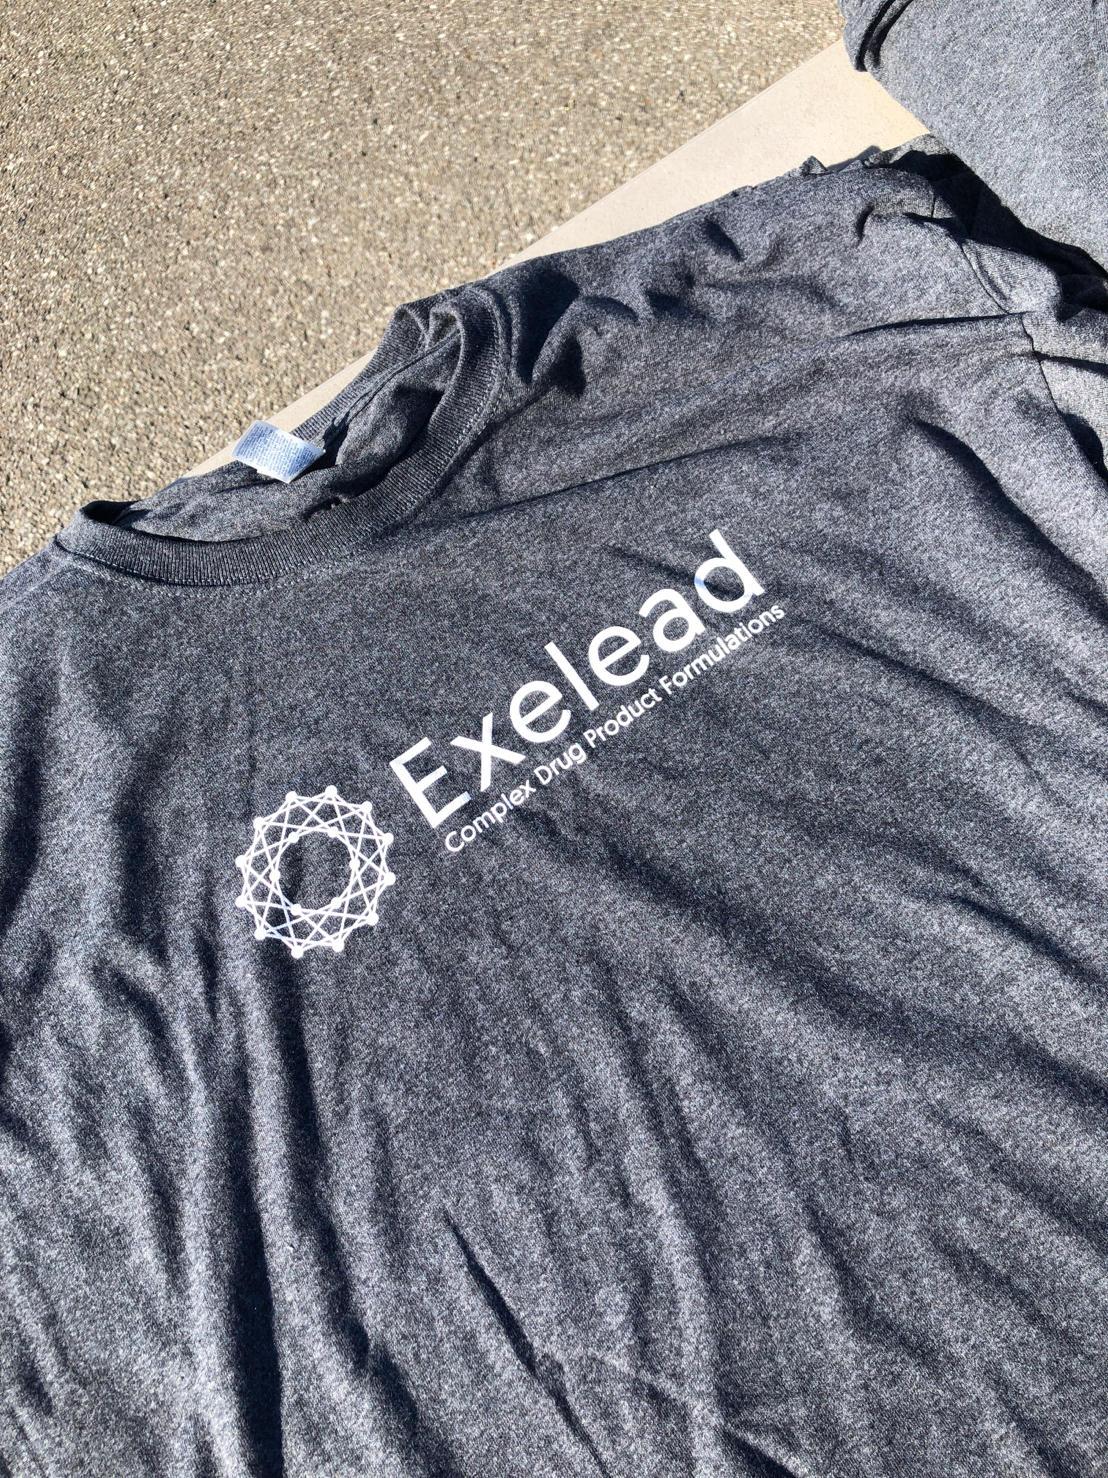 5k Shirt Exelead